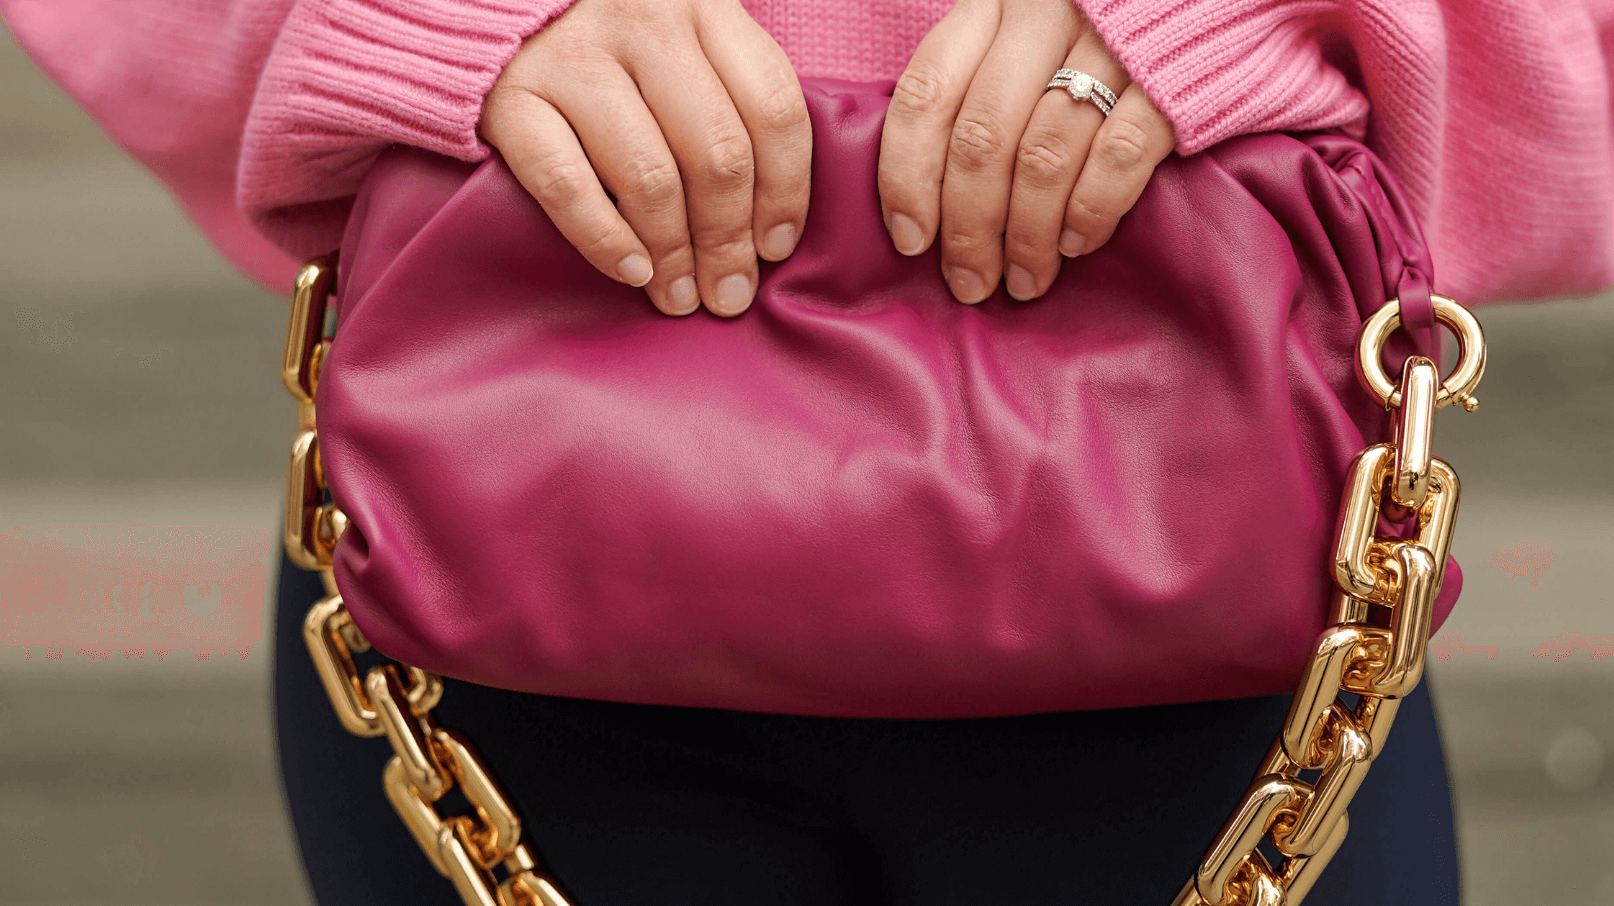 Loulou Studios Sweater Wardrobe NYC Pants Phillip Lim Booties Bottega Veneta Bag Outfit by Modnitsa Styling